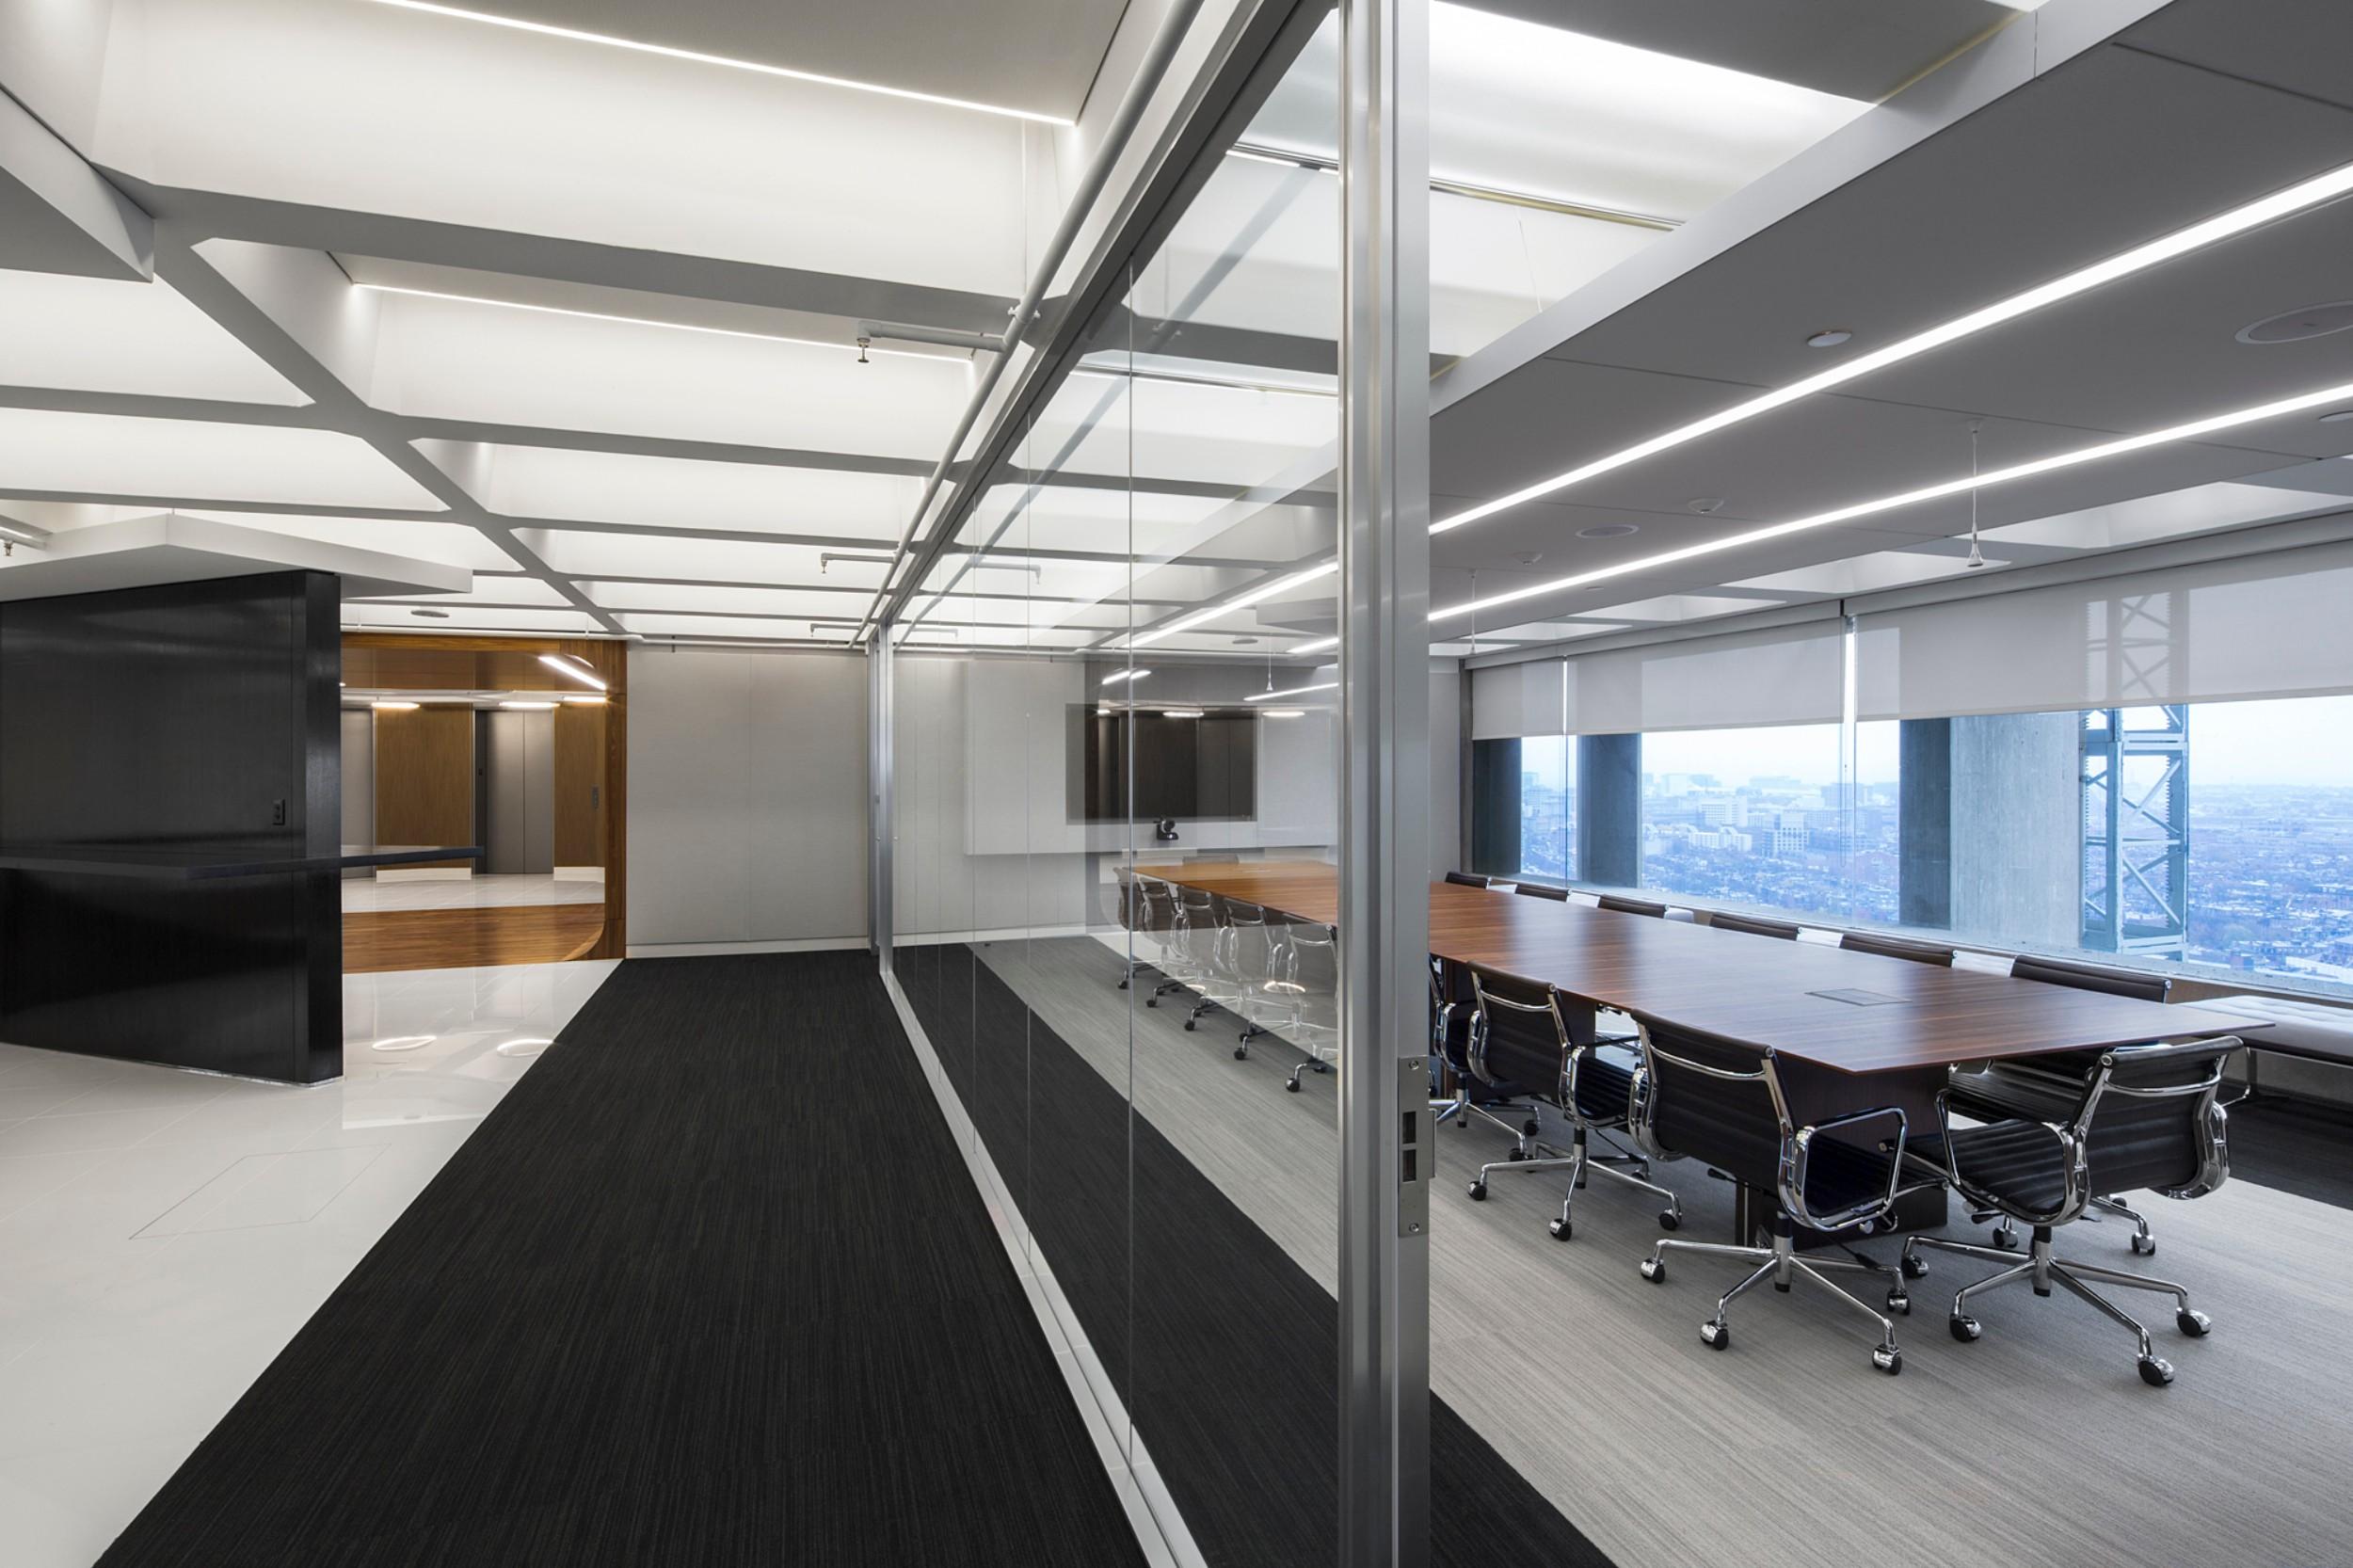 Kensington_Capital_Ventures_Holdings_Corderman_Construction_Office_Finance_Boston_Hallway.jpg